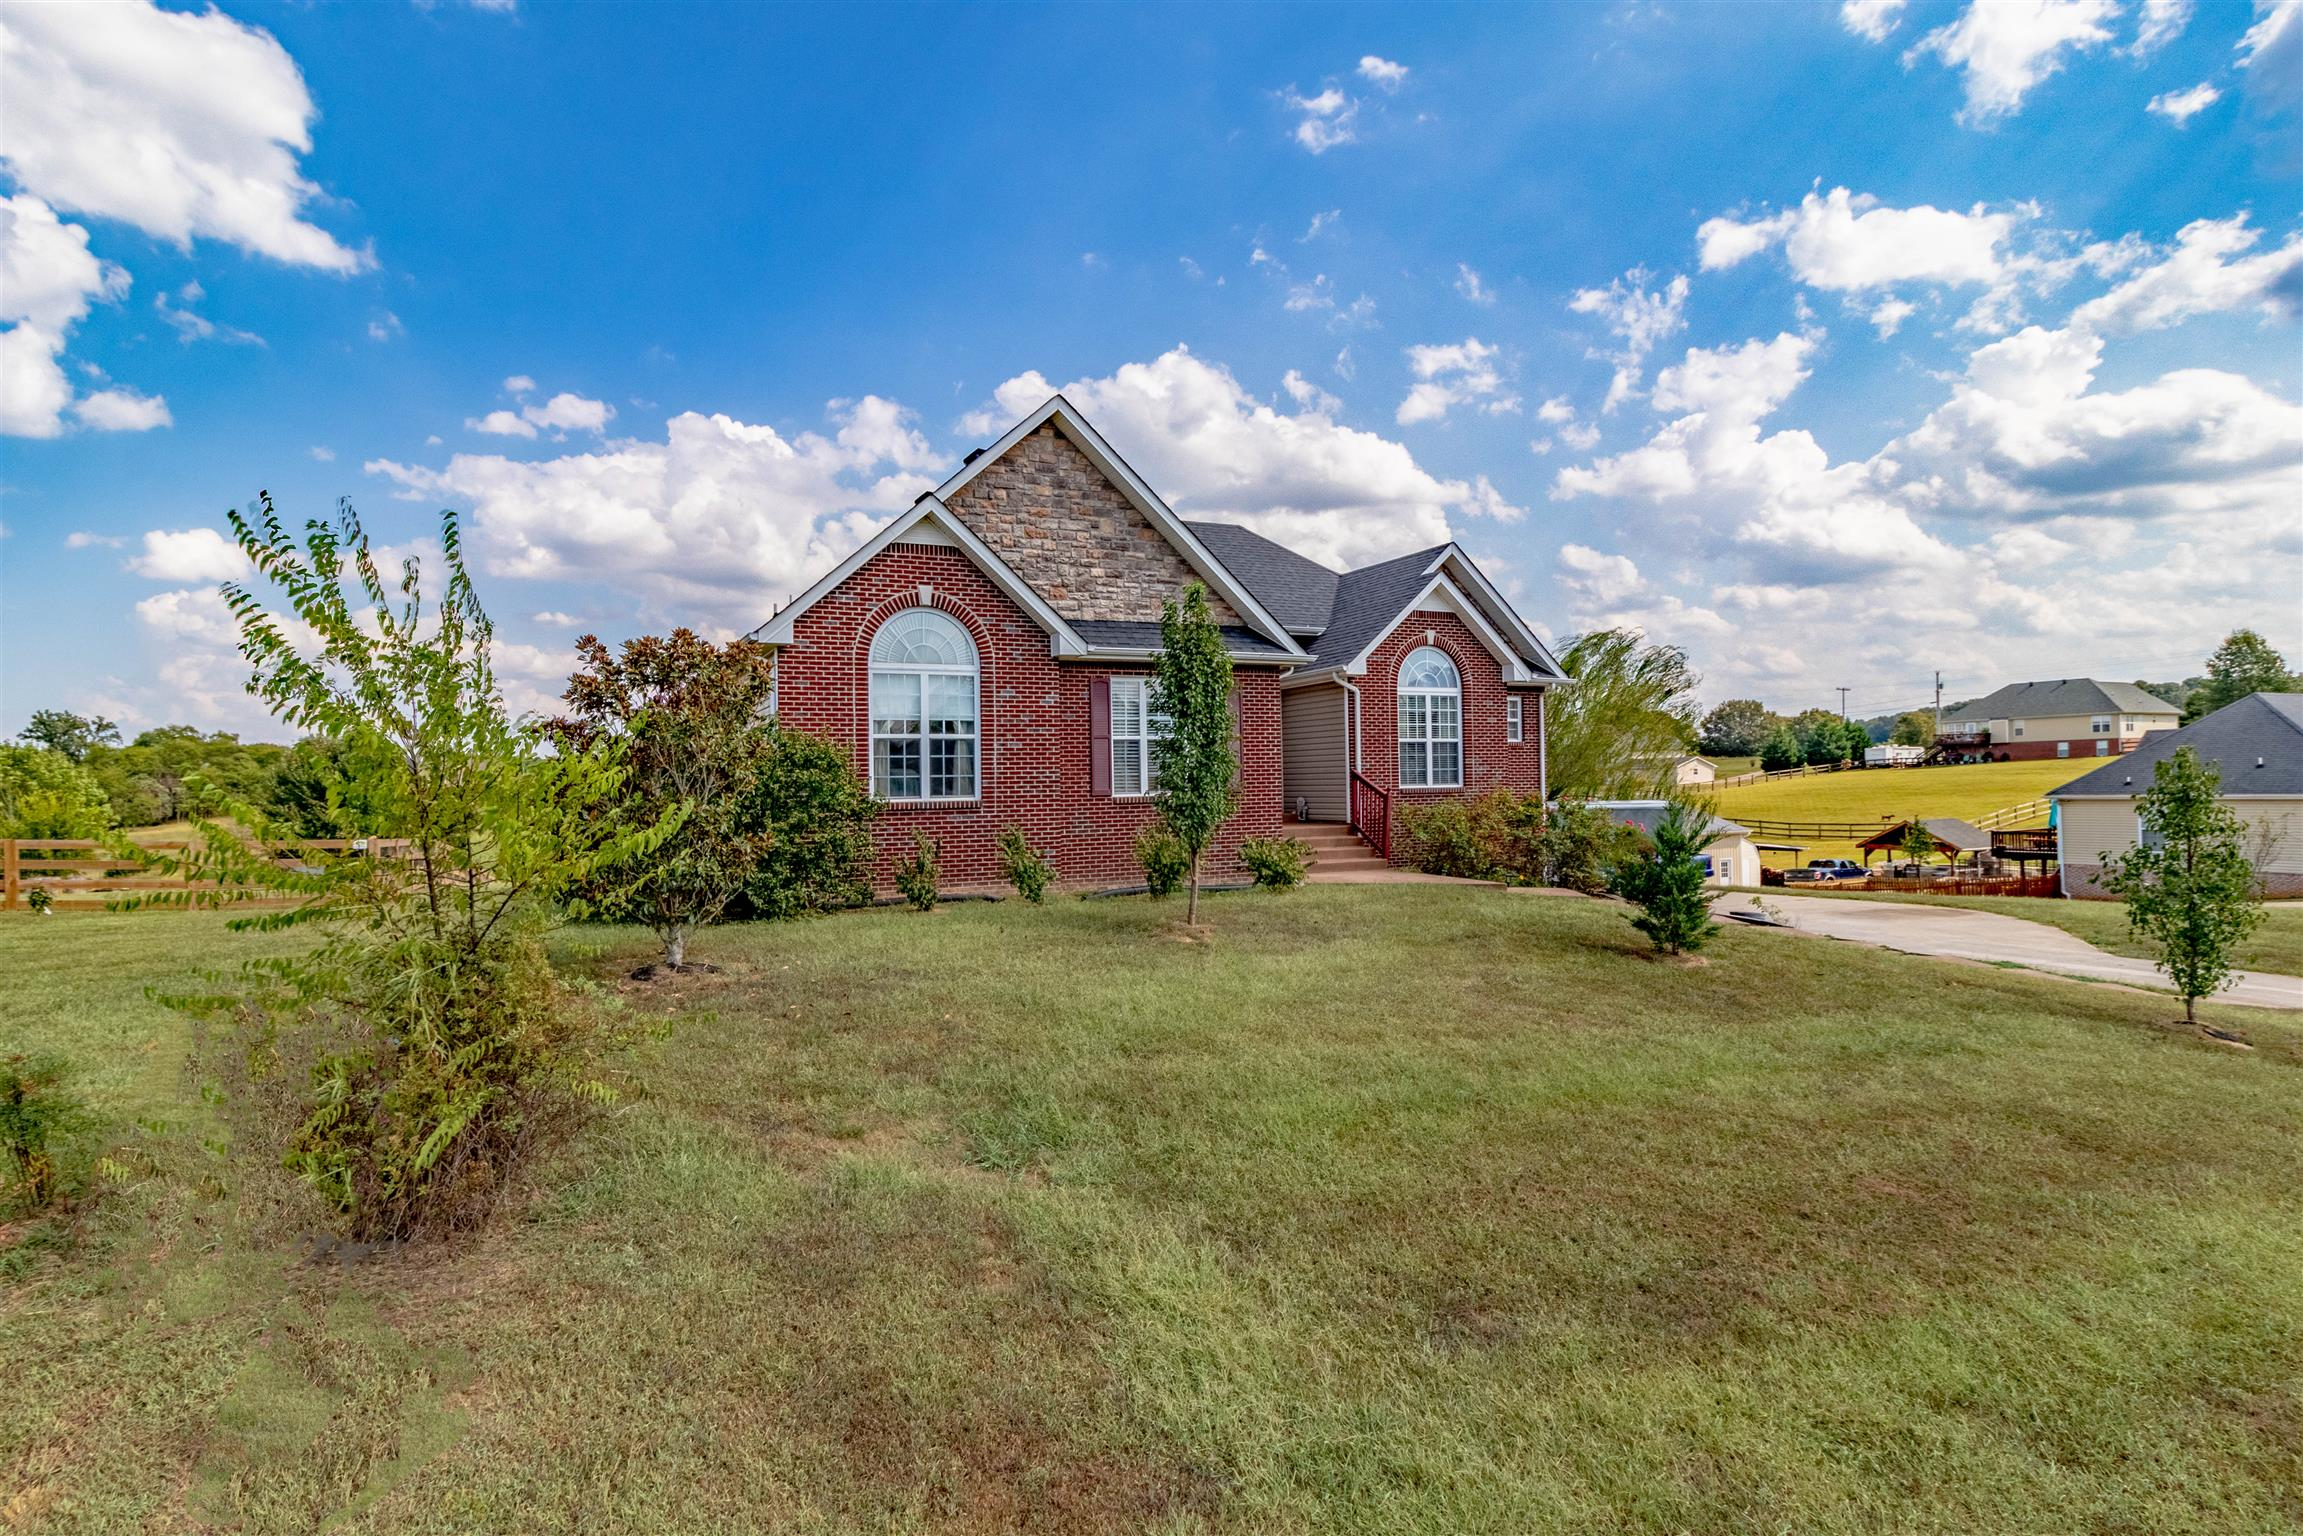 3681 Blackford Hills Rd, Cunningham, TN 37052 - Cunningham, TN real estate listing